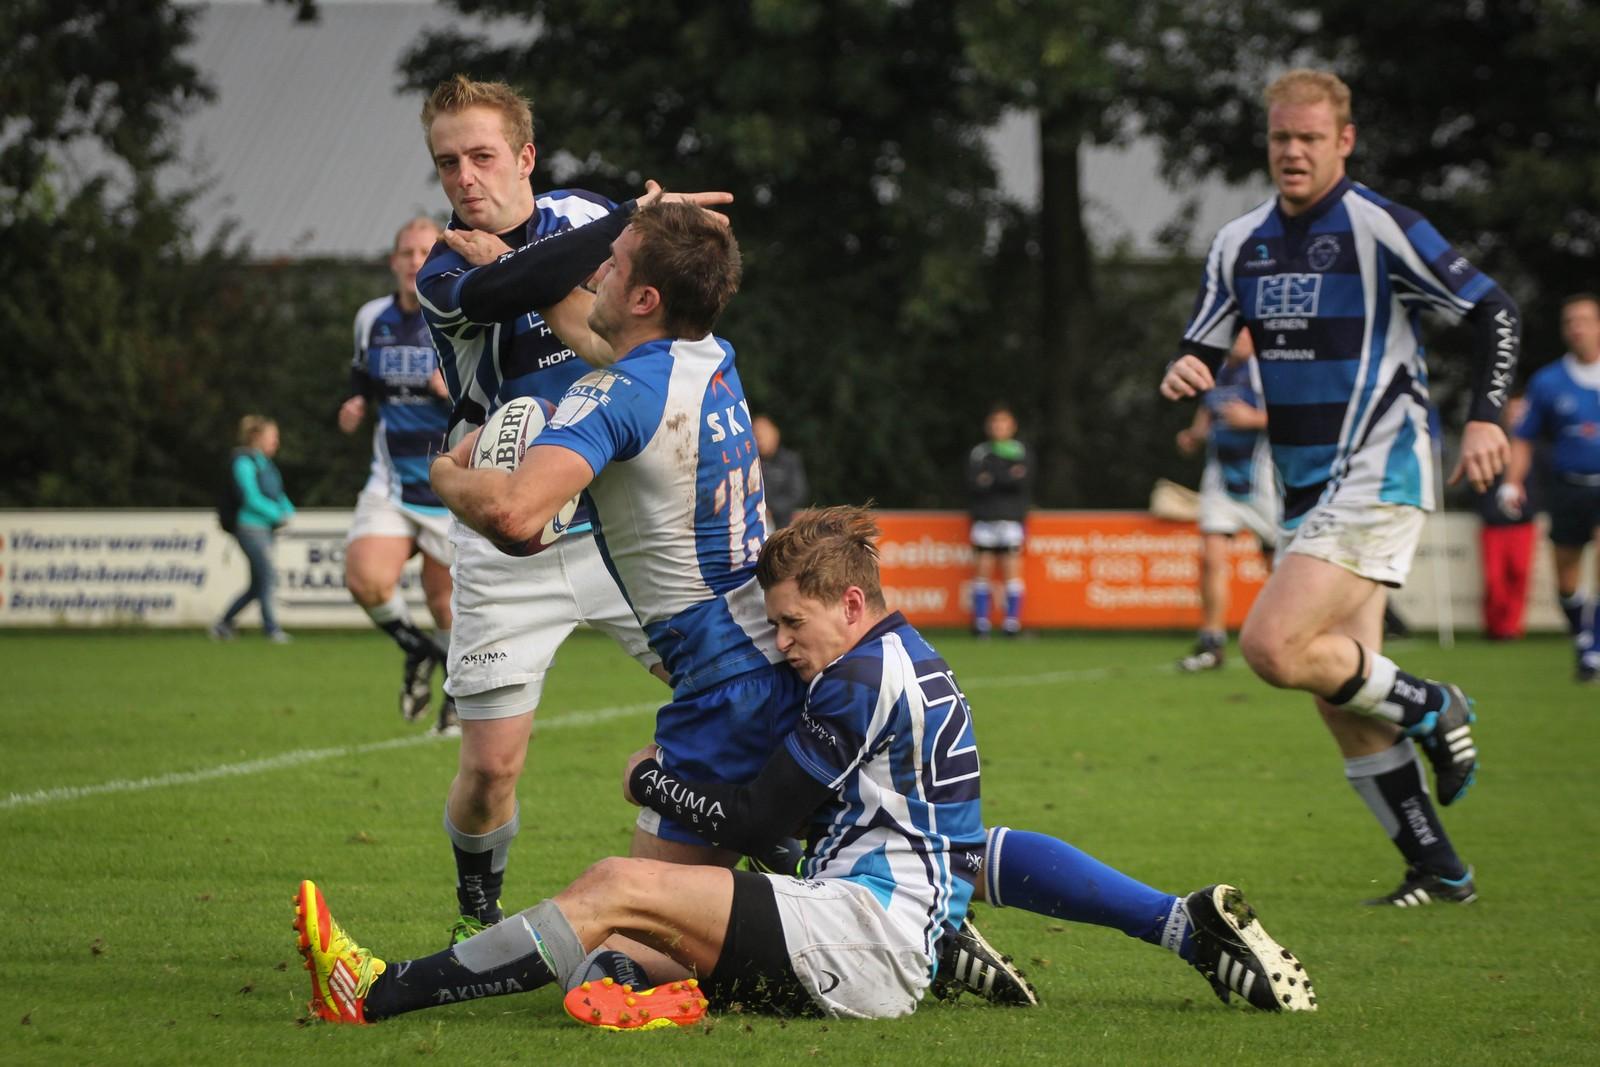 2013-10-12   RCS – Zwolle   20-14